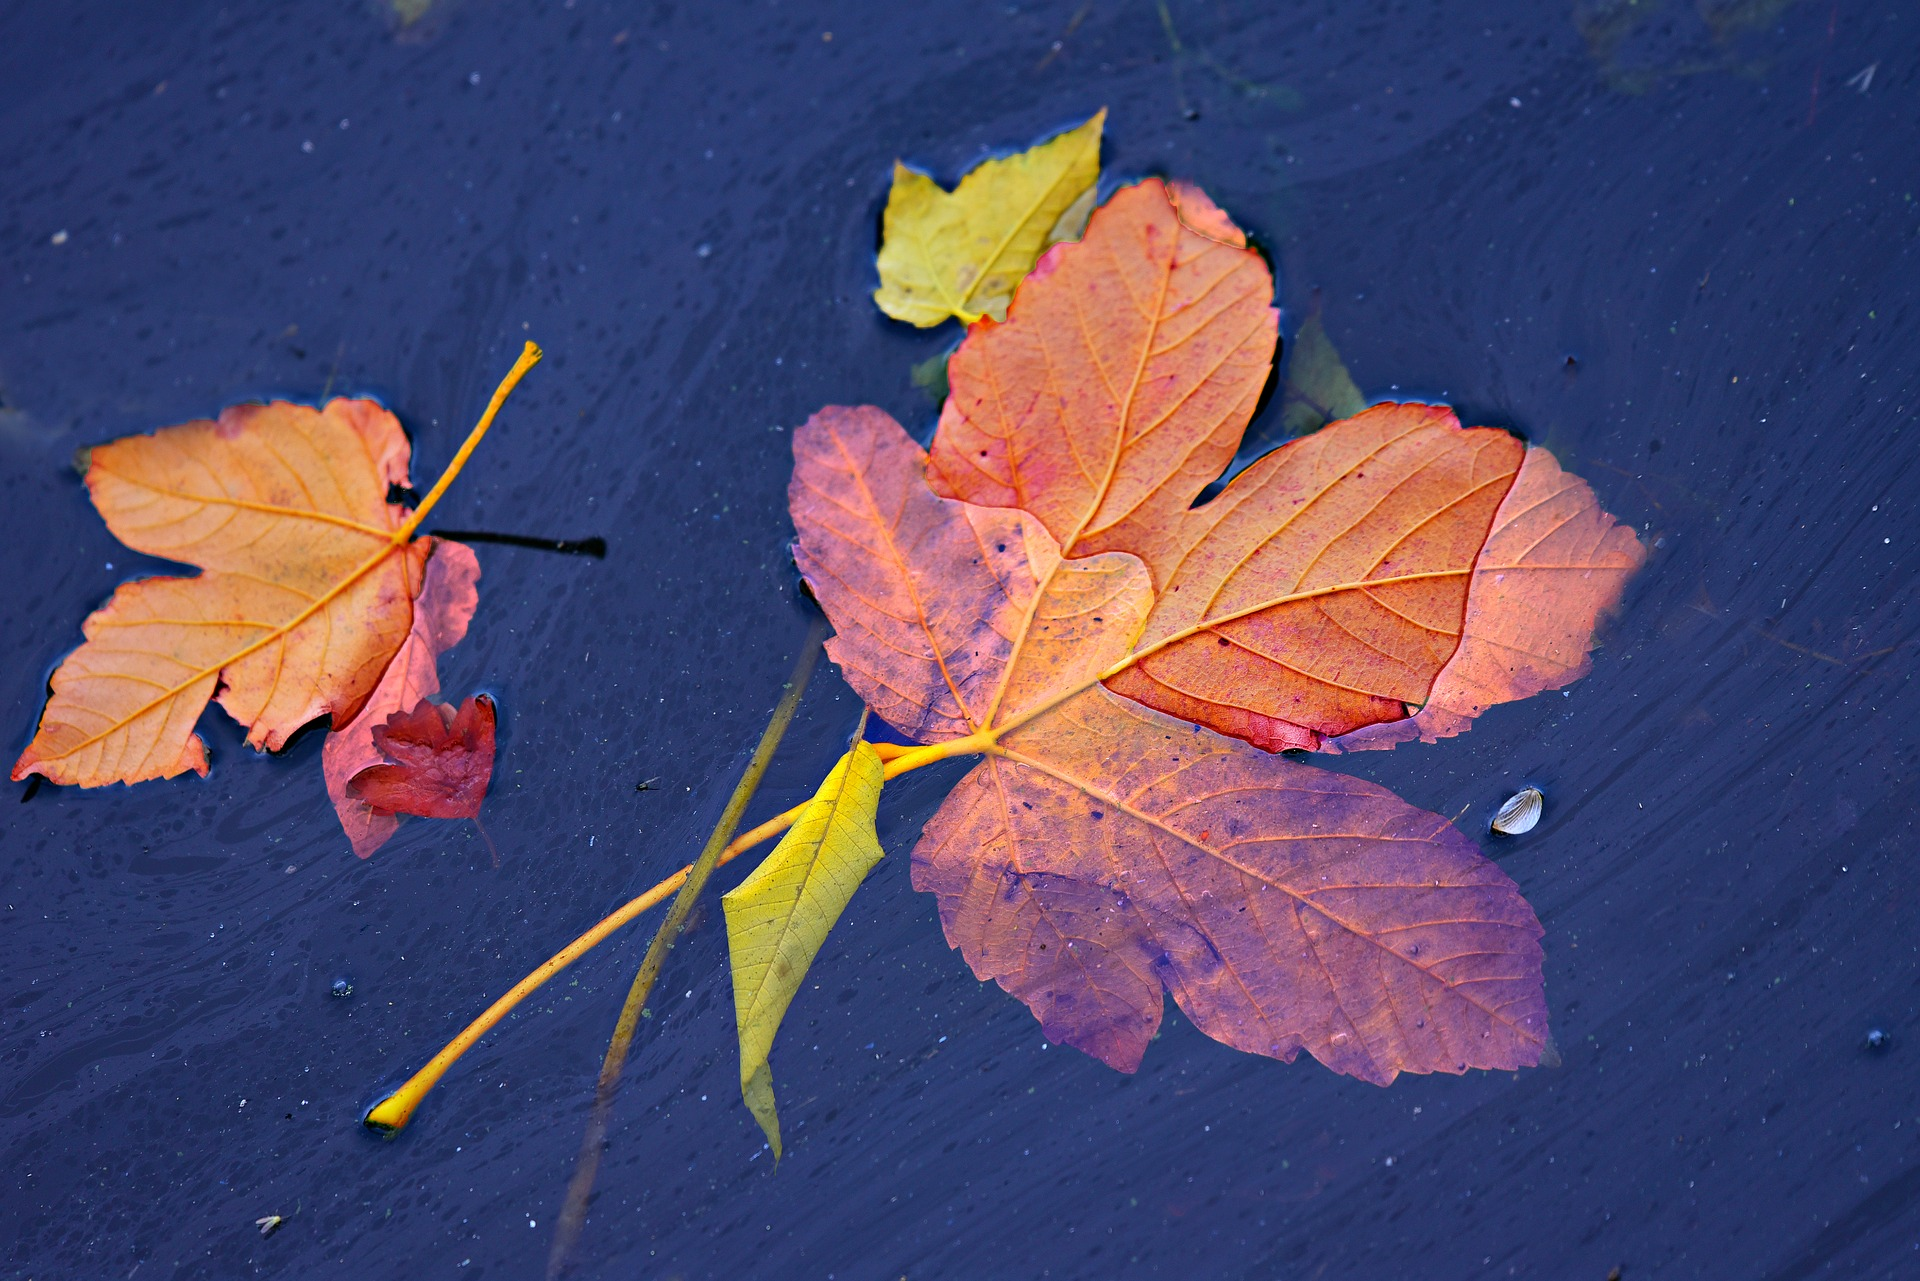 autumn-leaf-3784751_1920.jpg